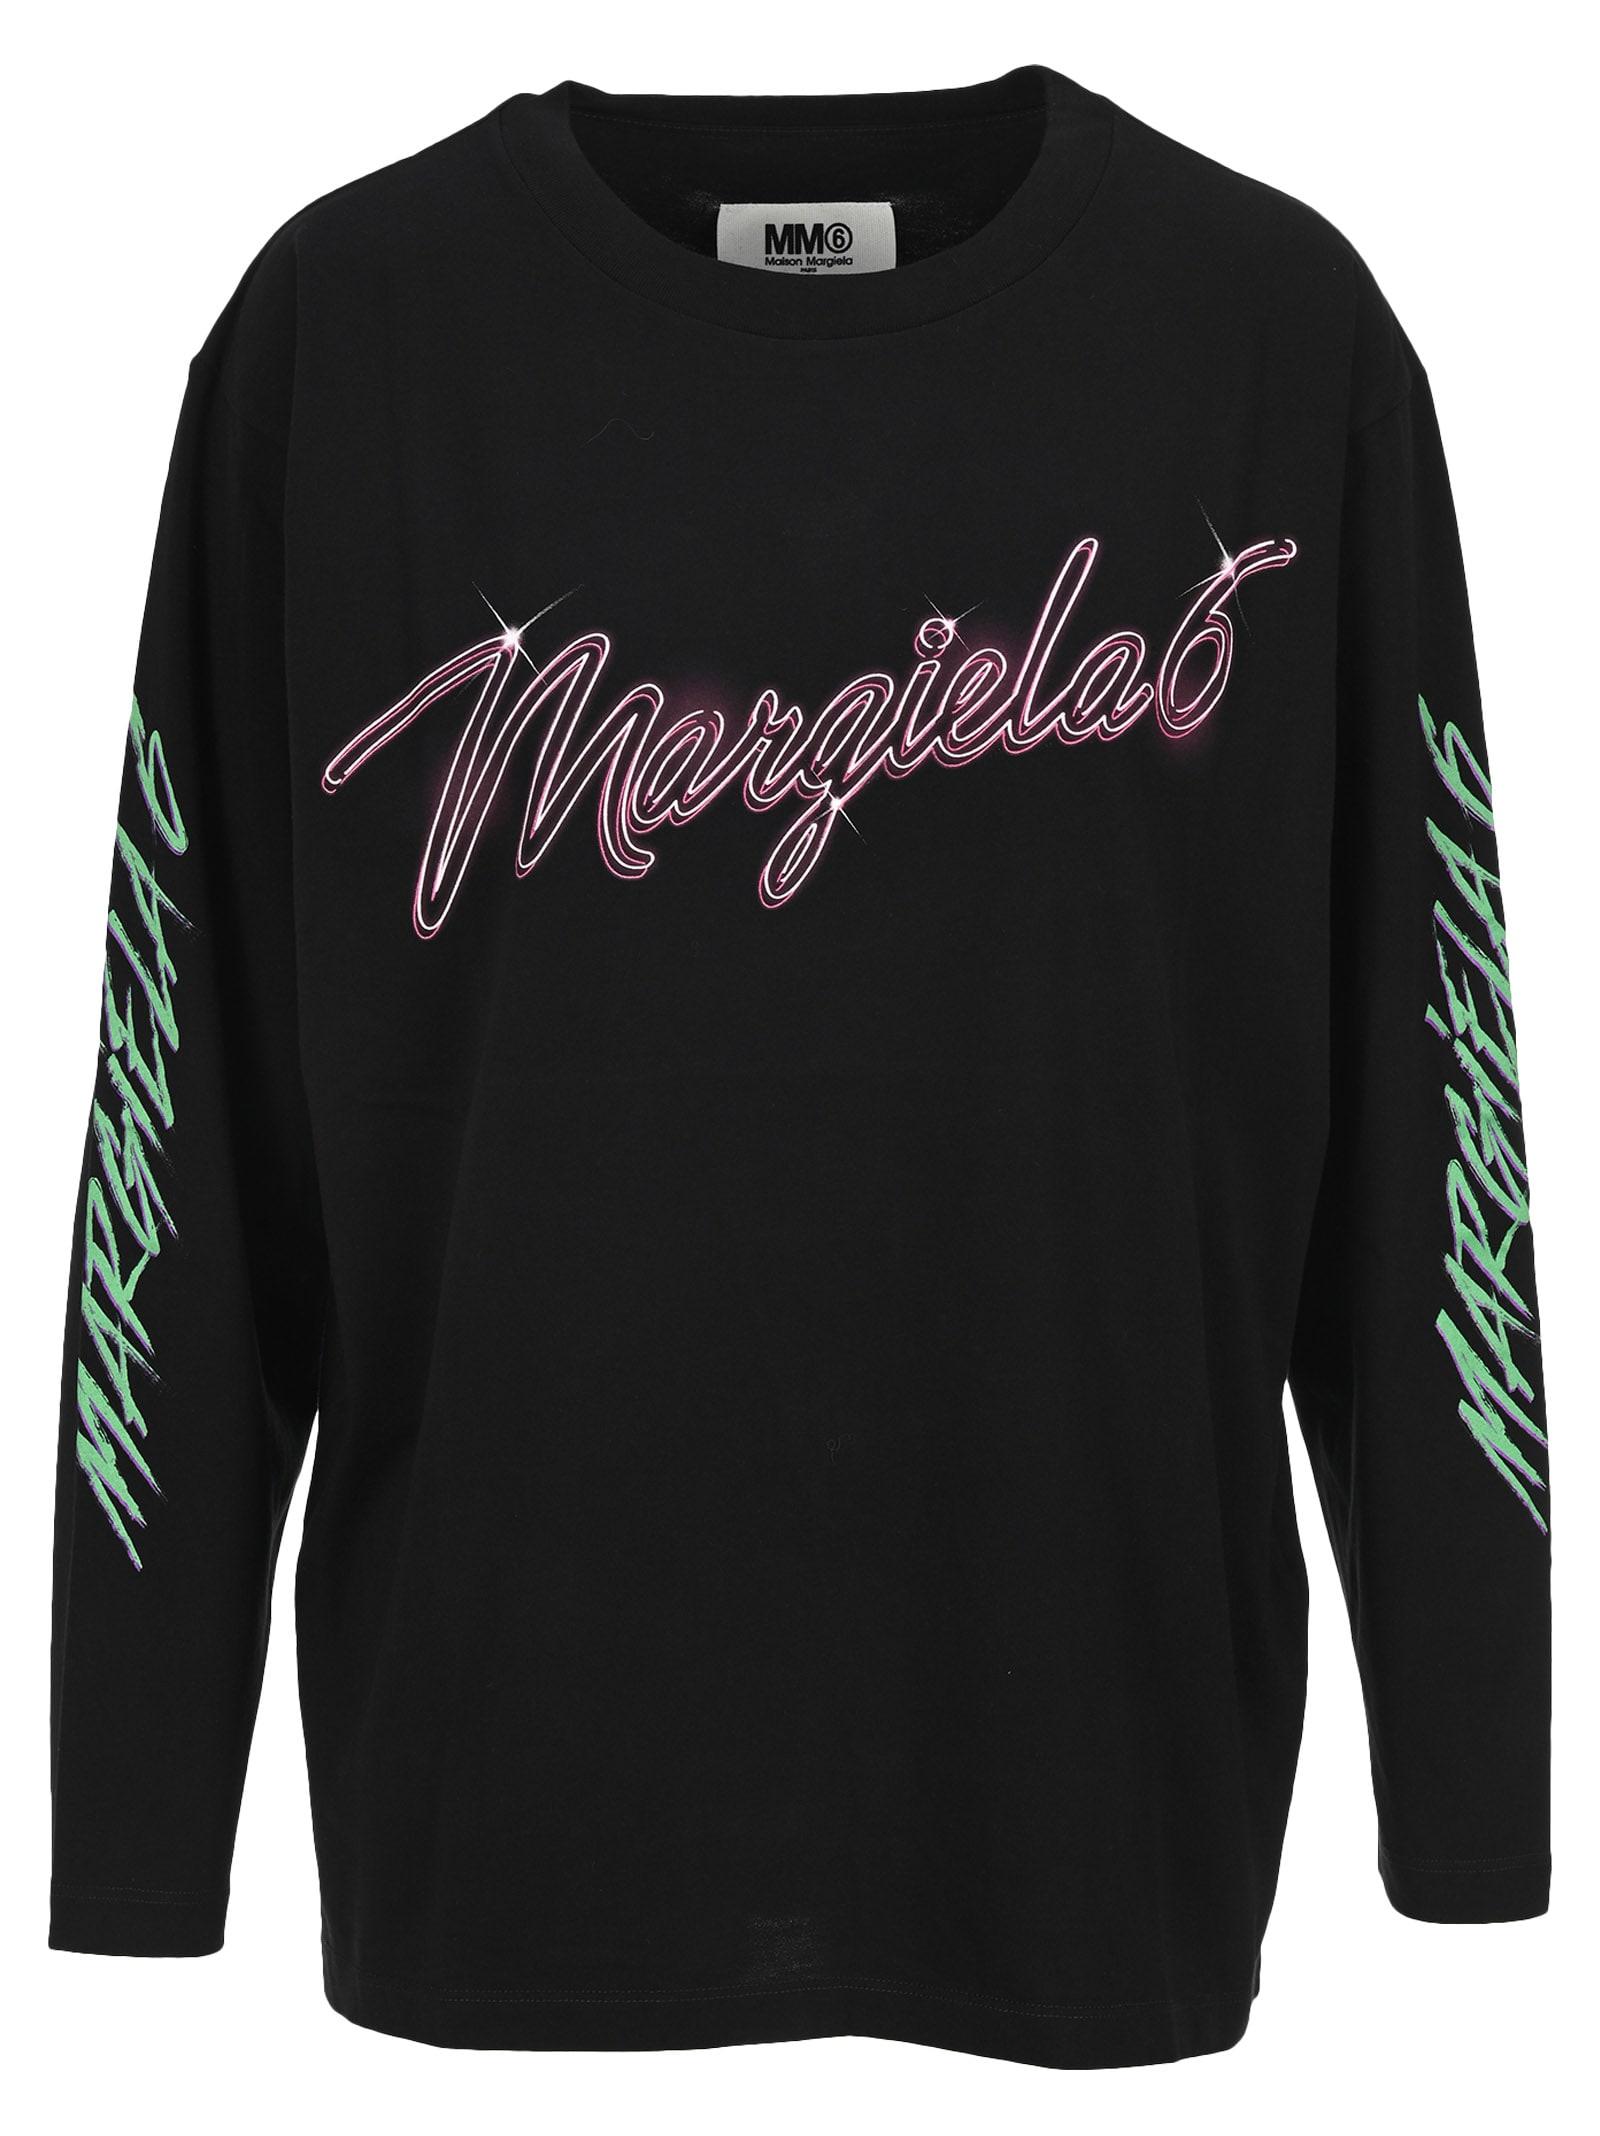 Mm6 Logo Print Long Sleeves T-shirt